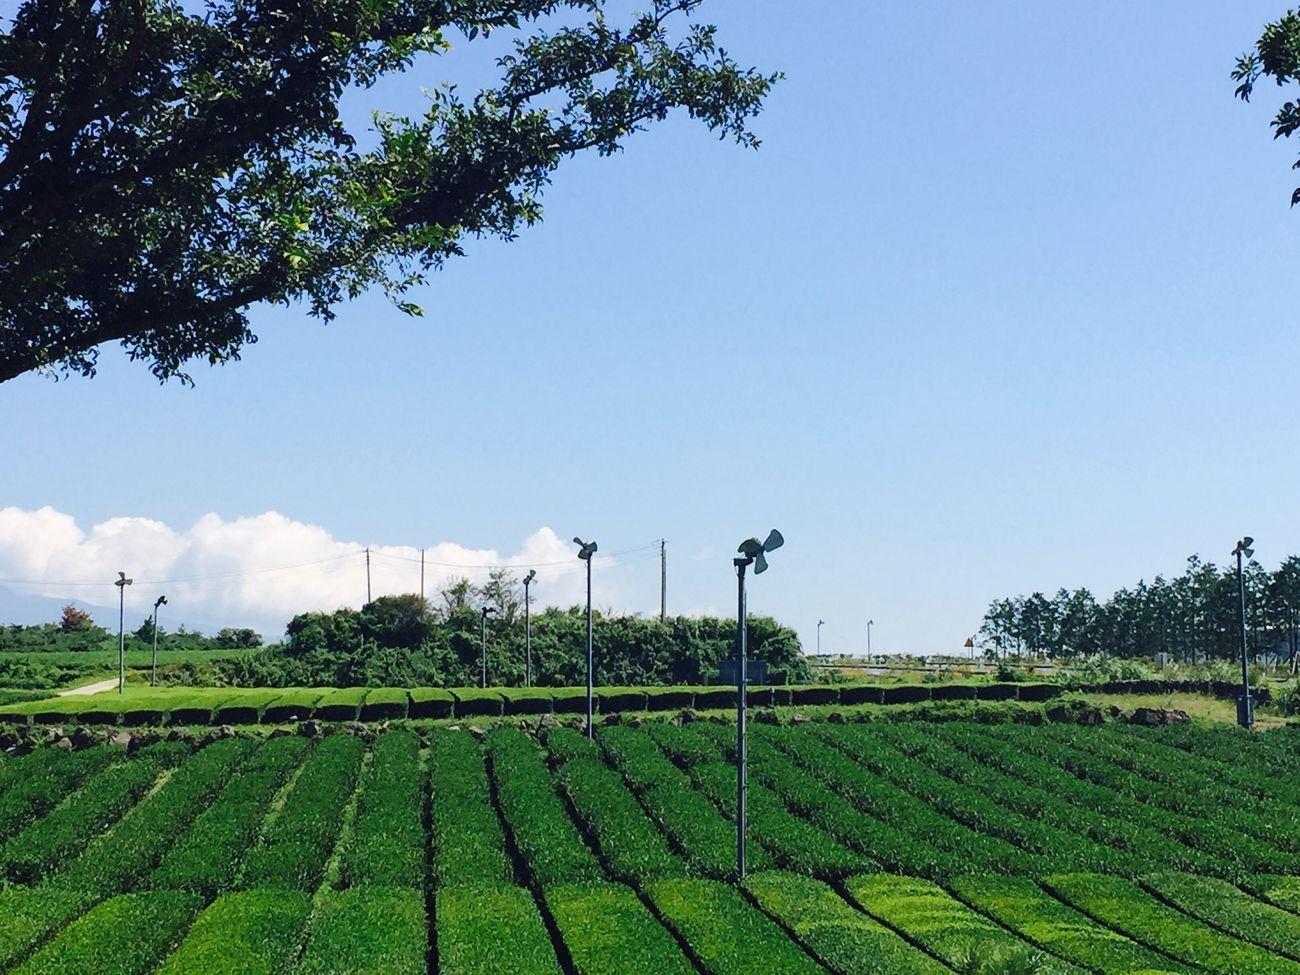 Green tea!🍃❤️💘 Jeju JEJU ISLAND  Korea Green Tea Green Leaves Field Innisfree Osulloc Summer IPhoneography Iphone6plus